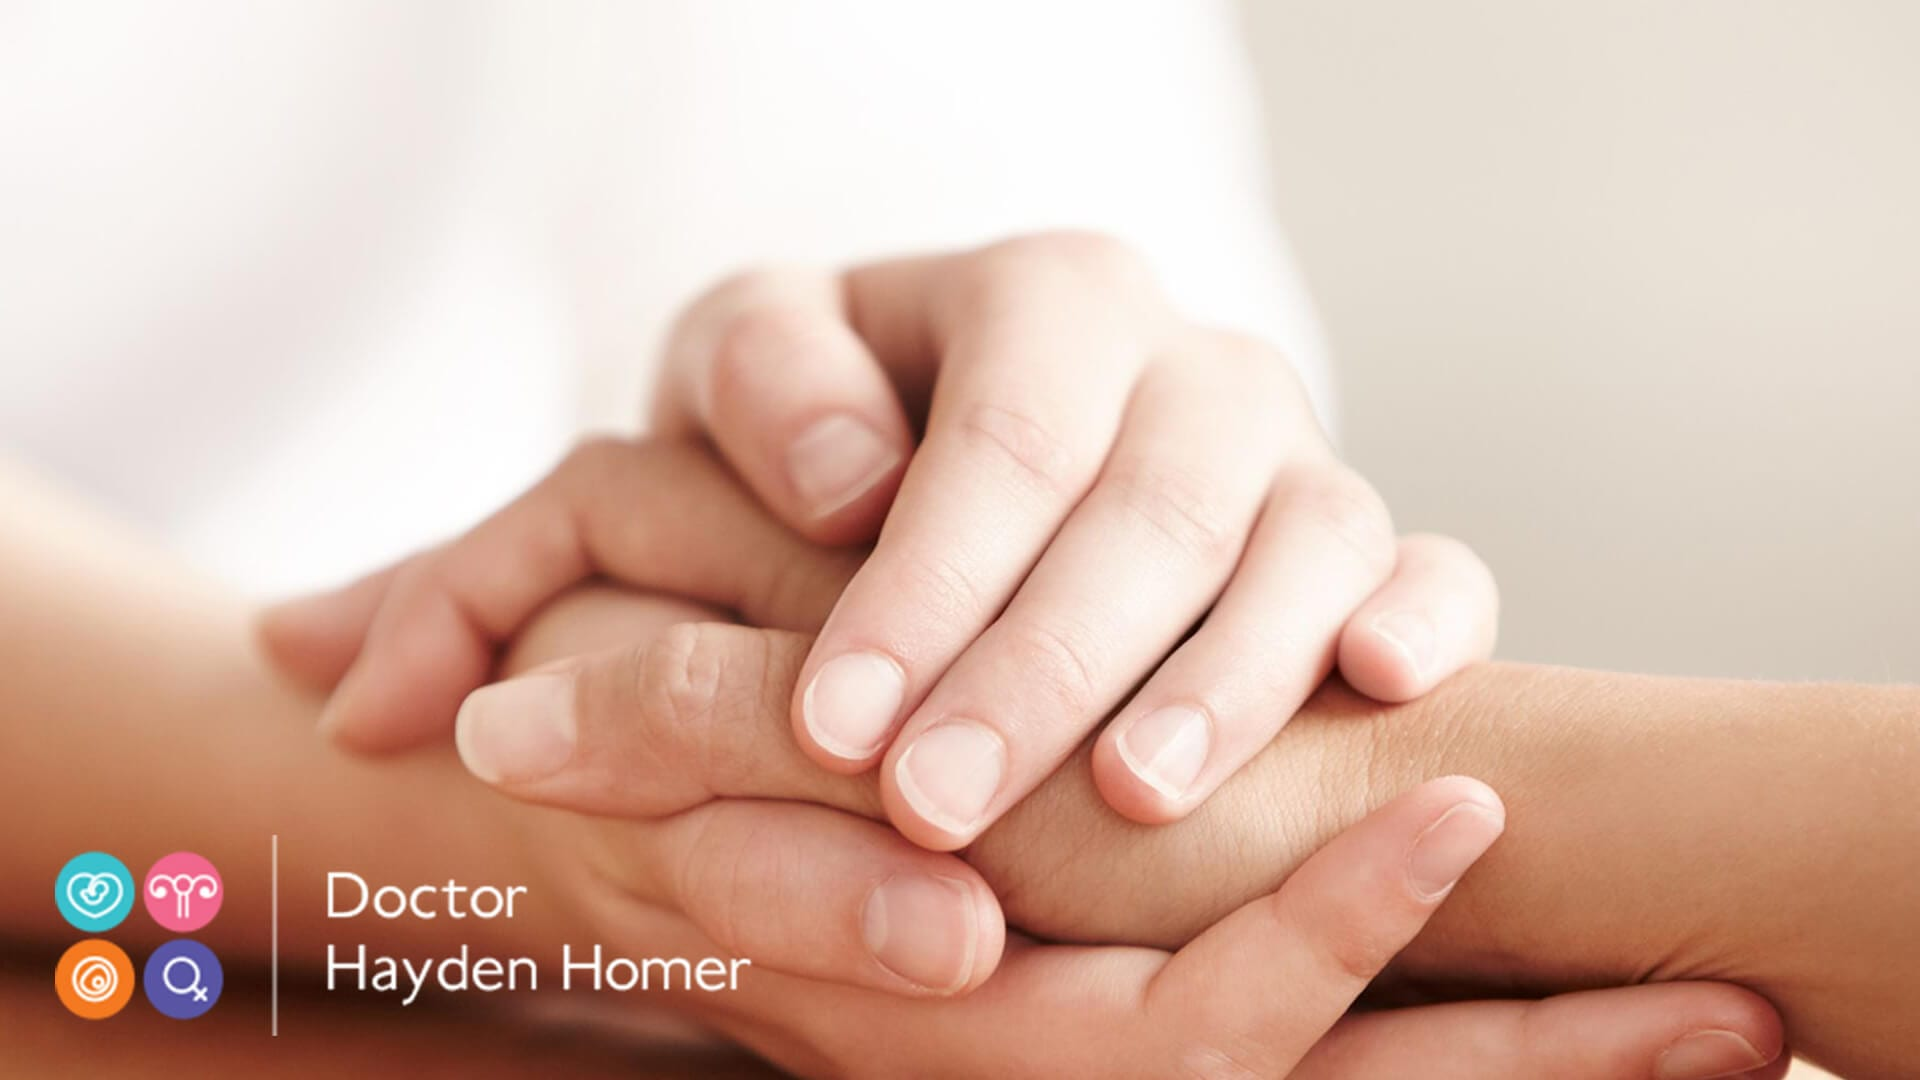 Dr Hayden Homer